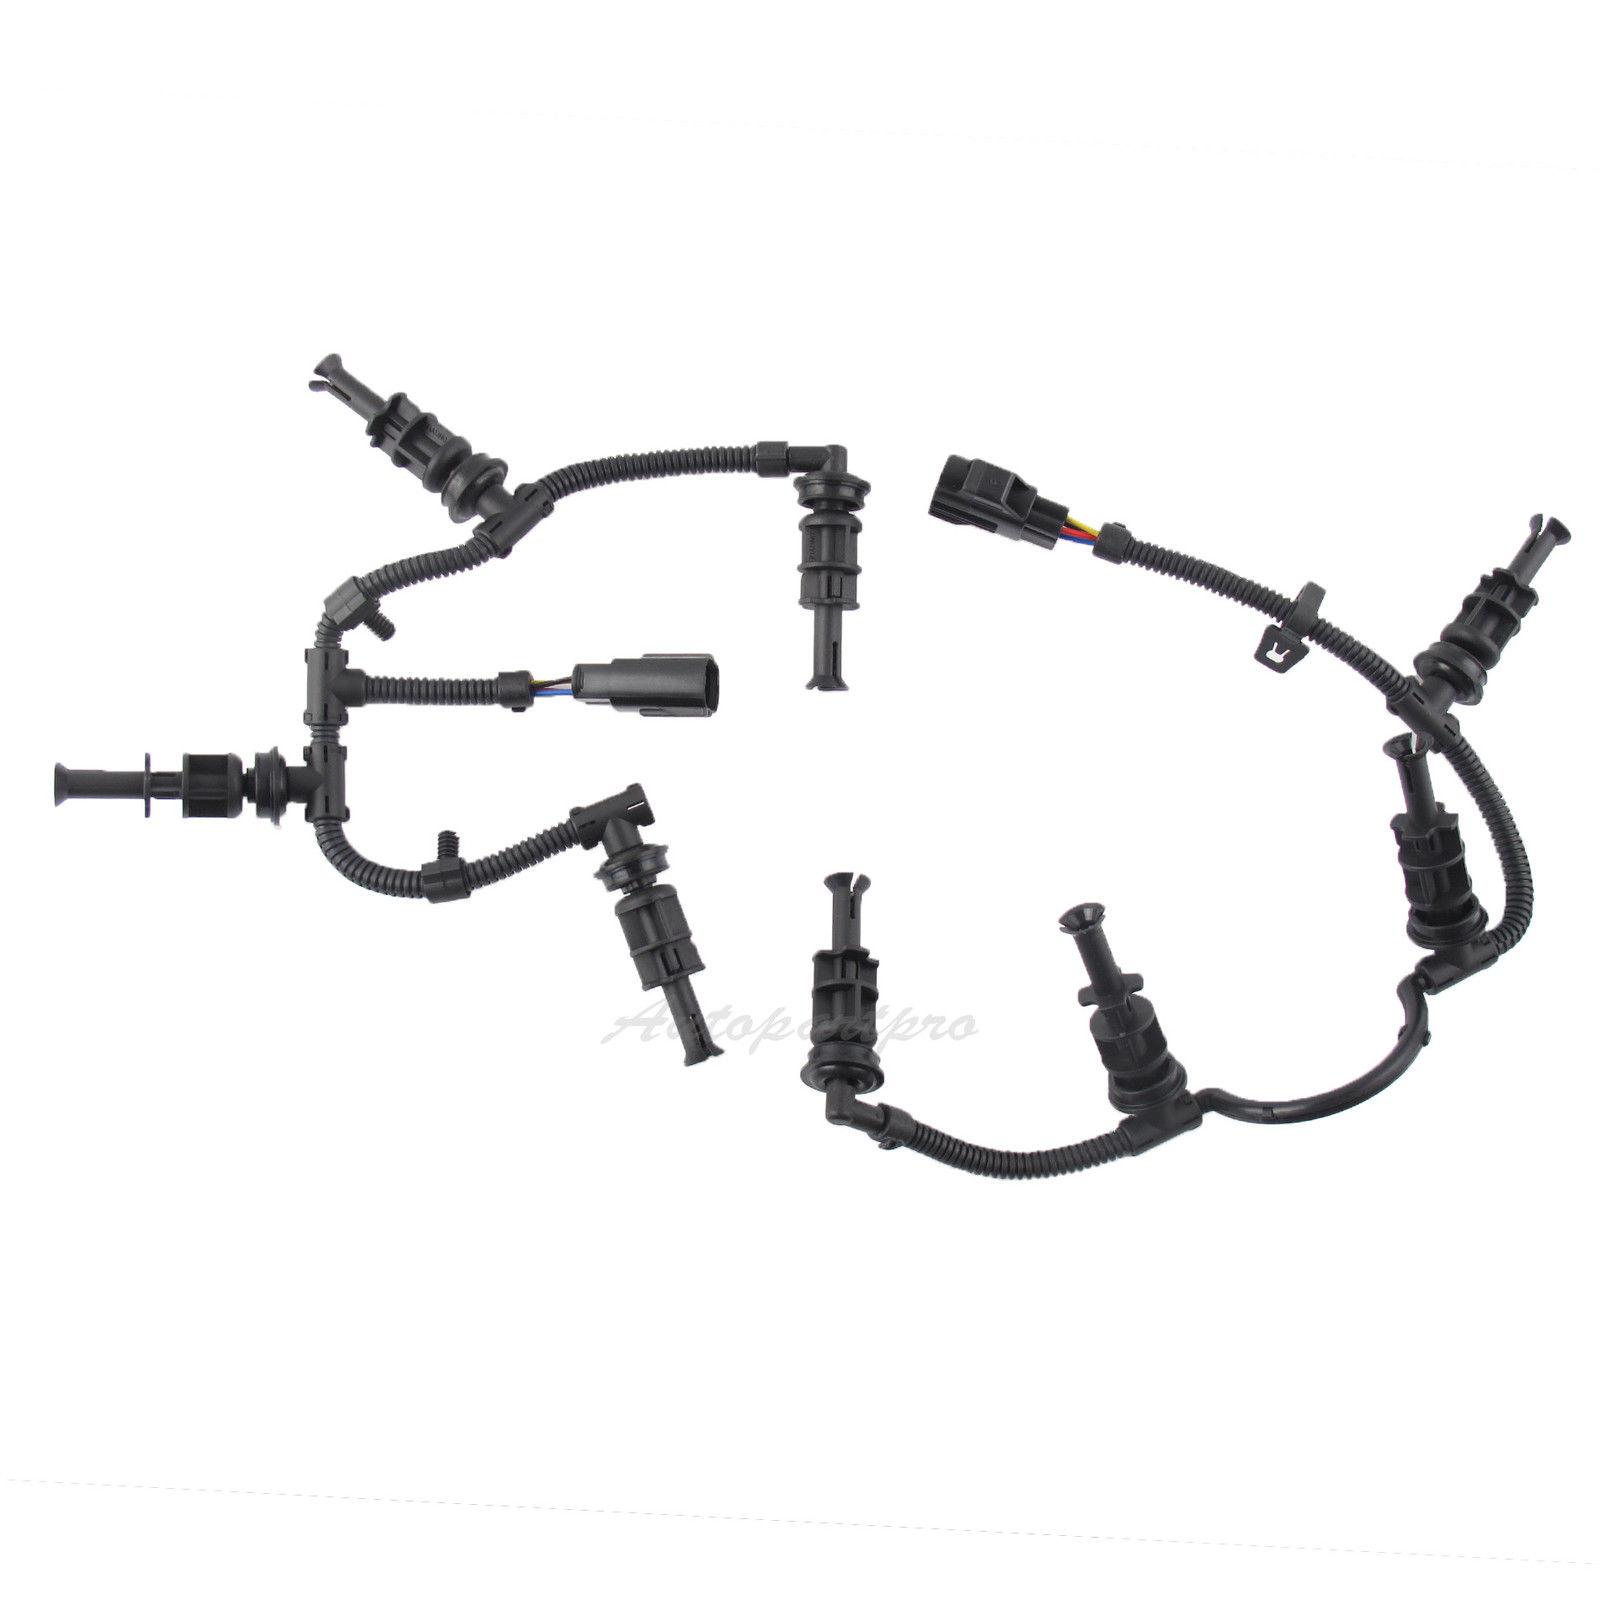 2008-2010 Ford F350 6.4L Powerstroke Glow Plug Wiring